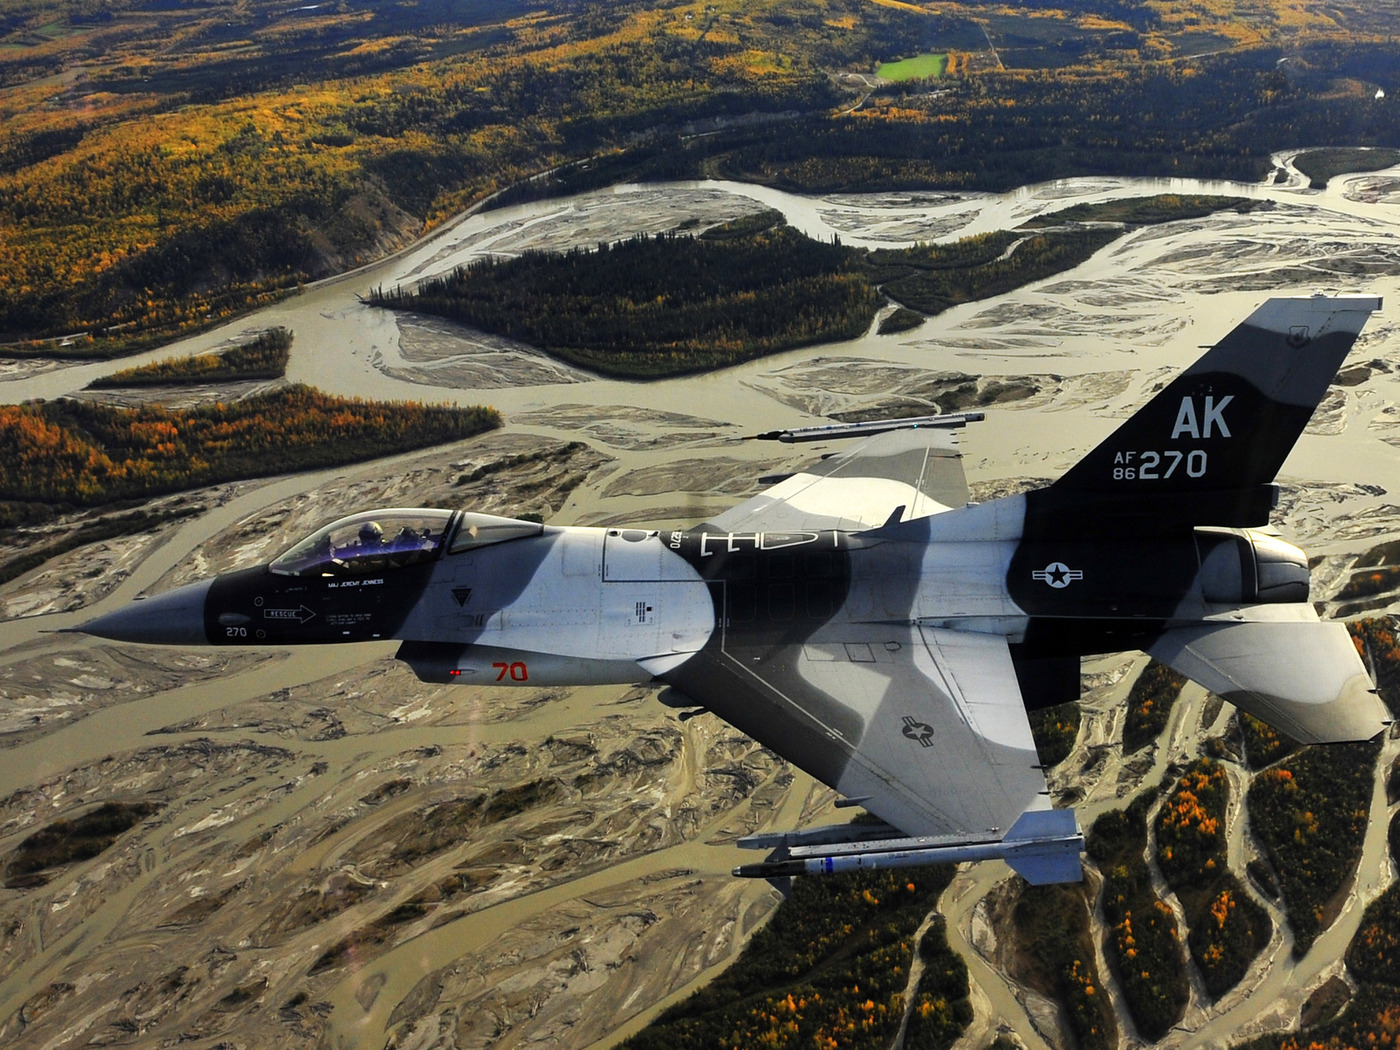 military-plane-qhd.jpg